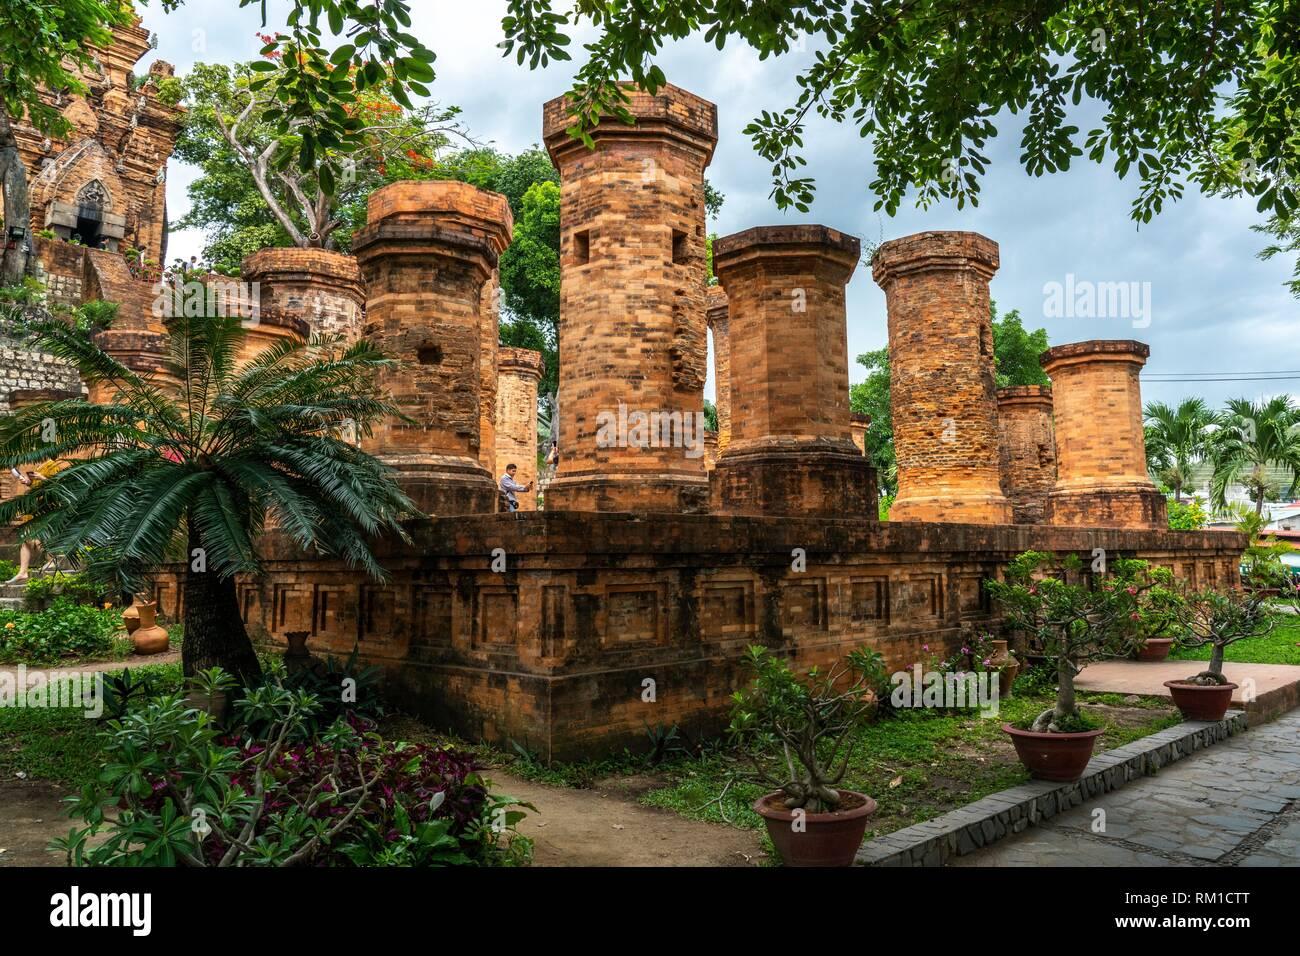 Cham temple Po Nagar near Nha Trang city, Vietnam, Asia - Stock Image